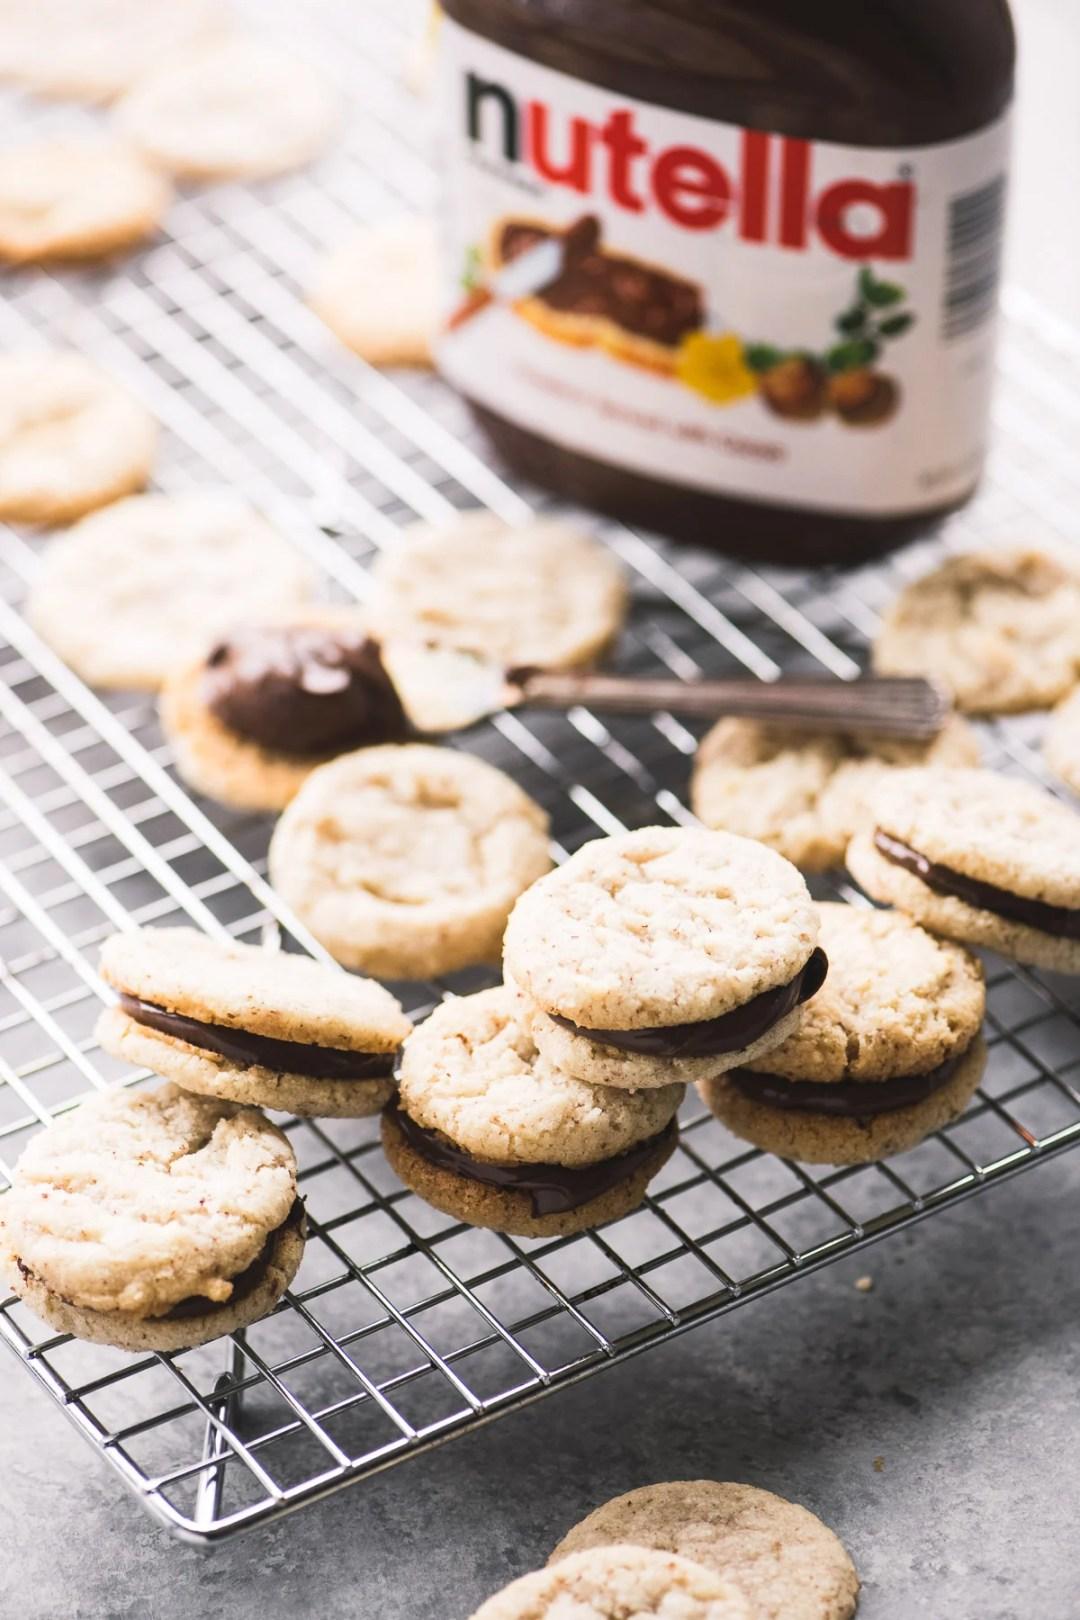 Making Nutella Sandwich Cookies